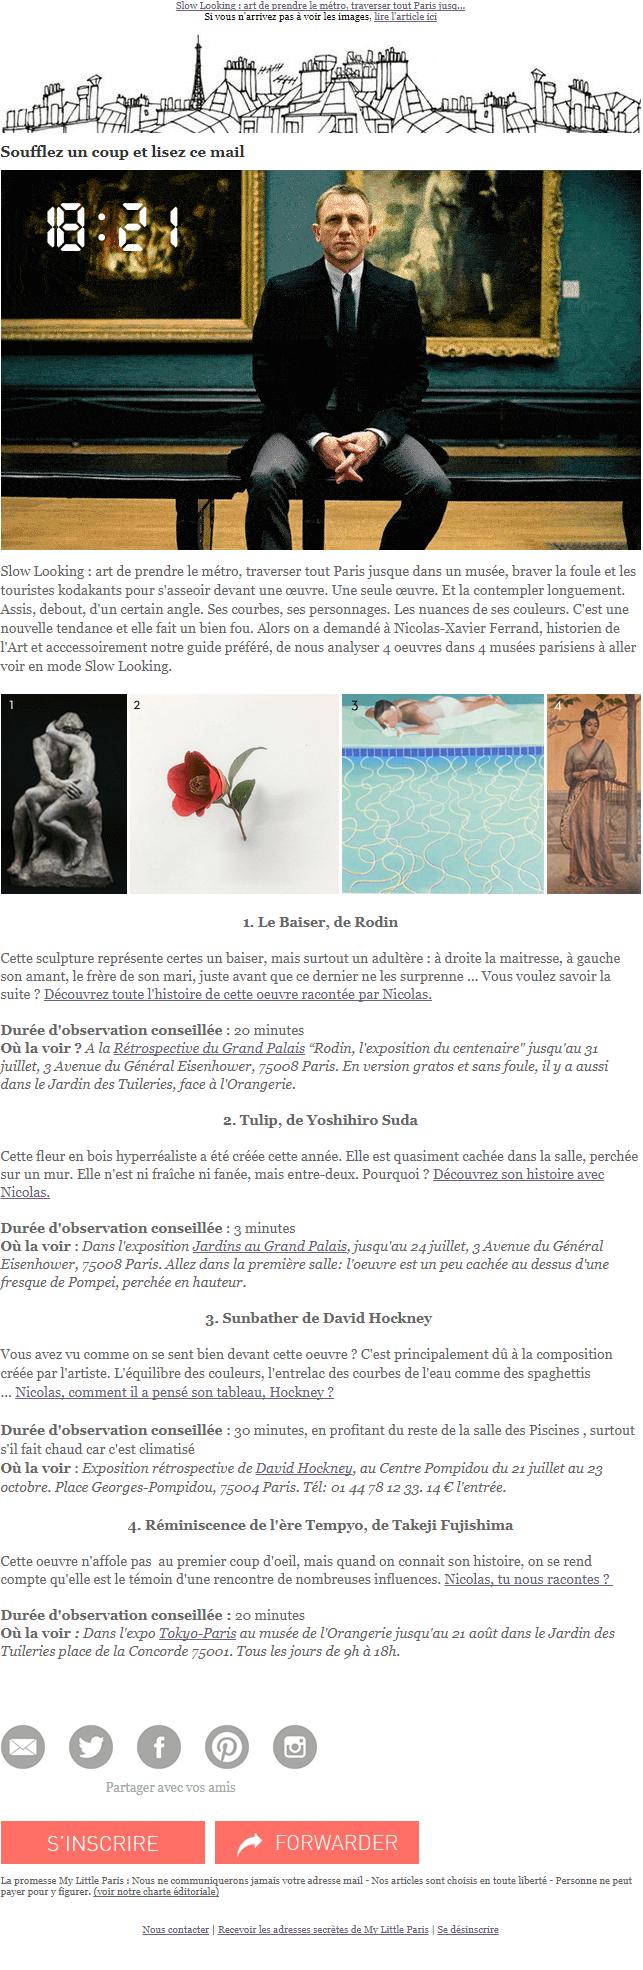 Exemple de newsletter #15 : My Little Paris